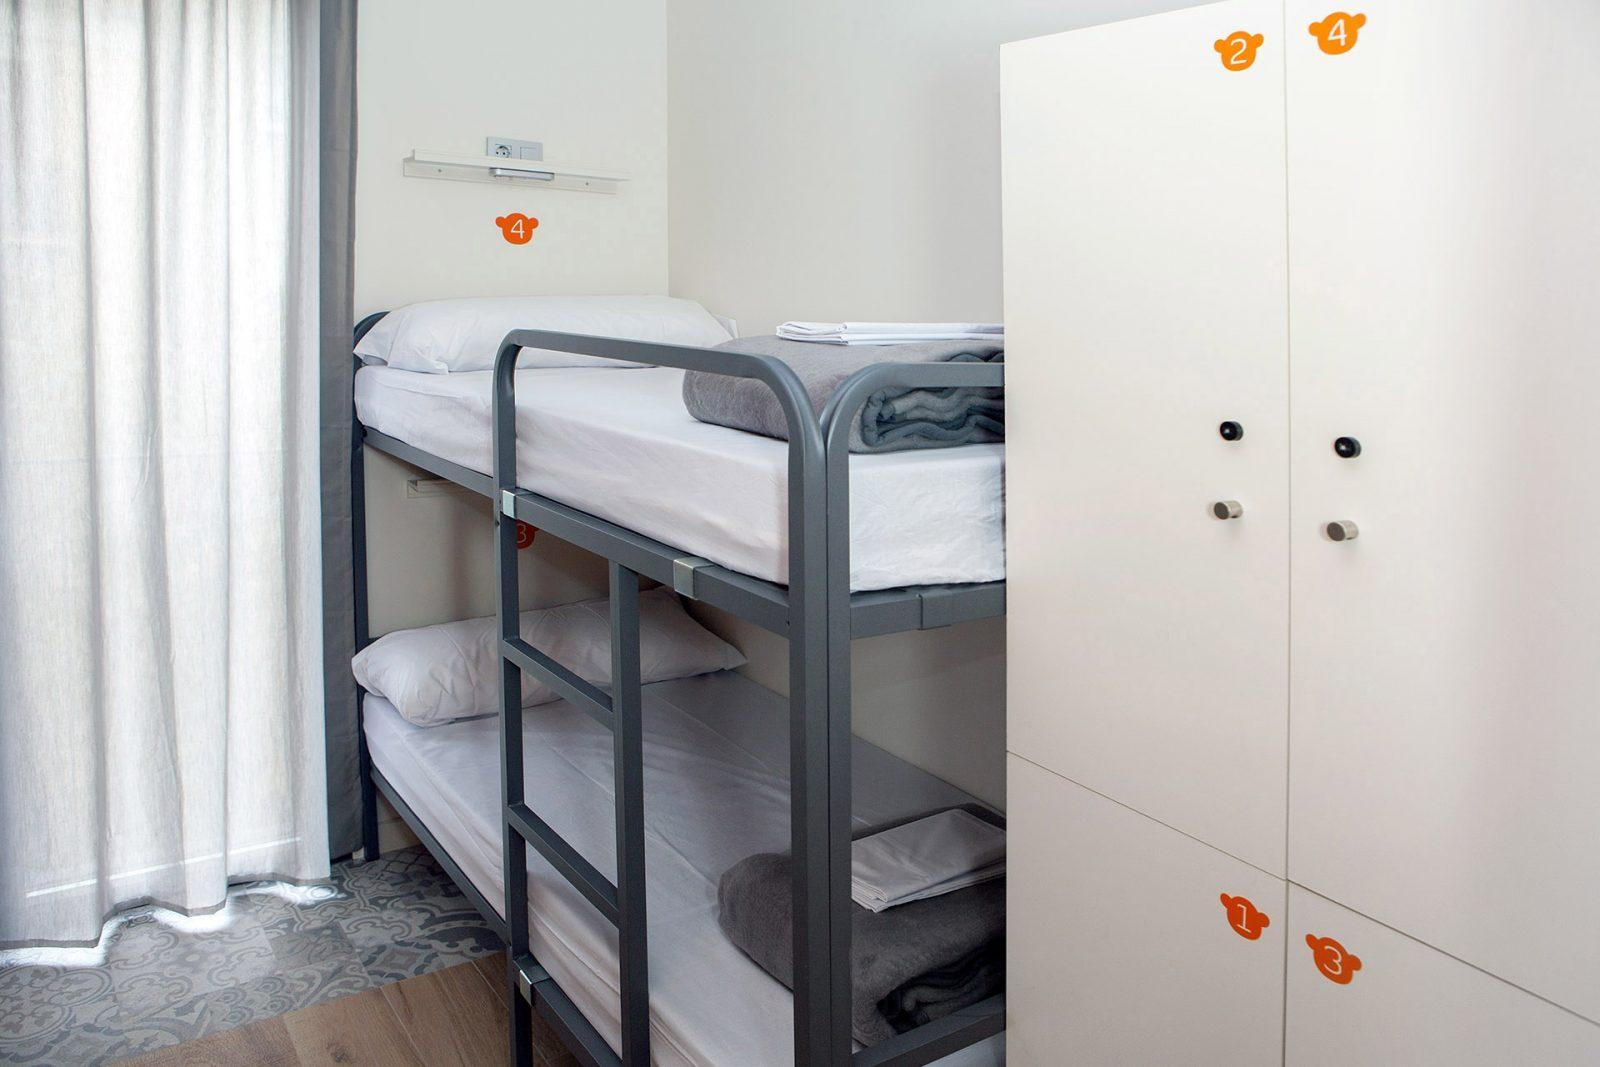 4 bed mixed dormitory